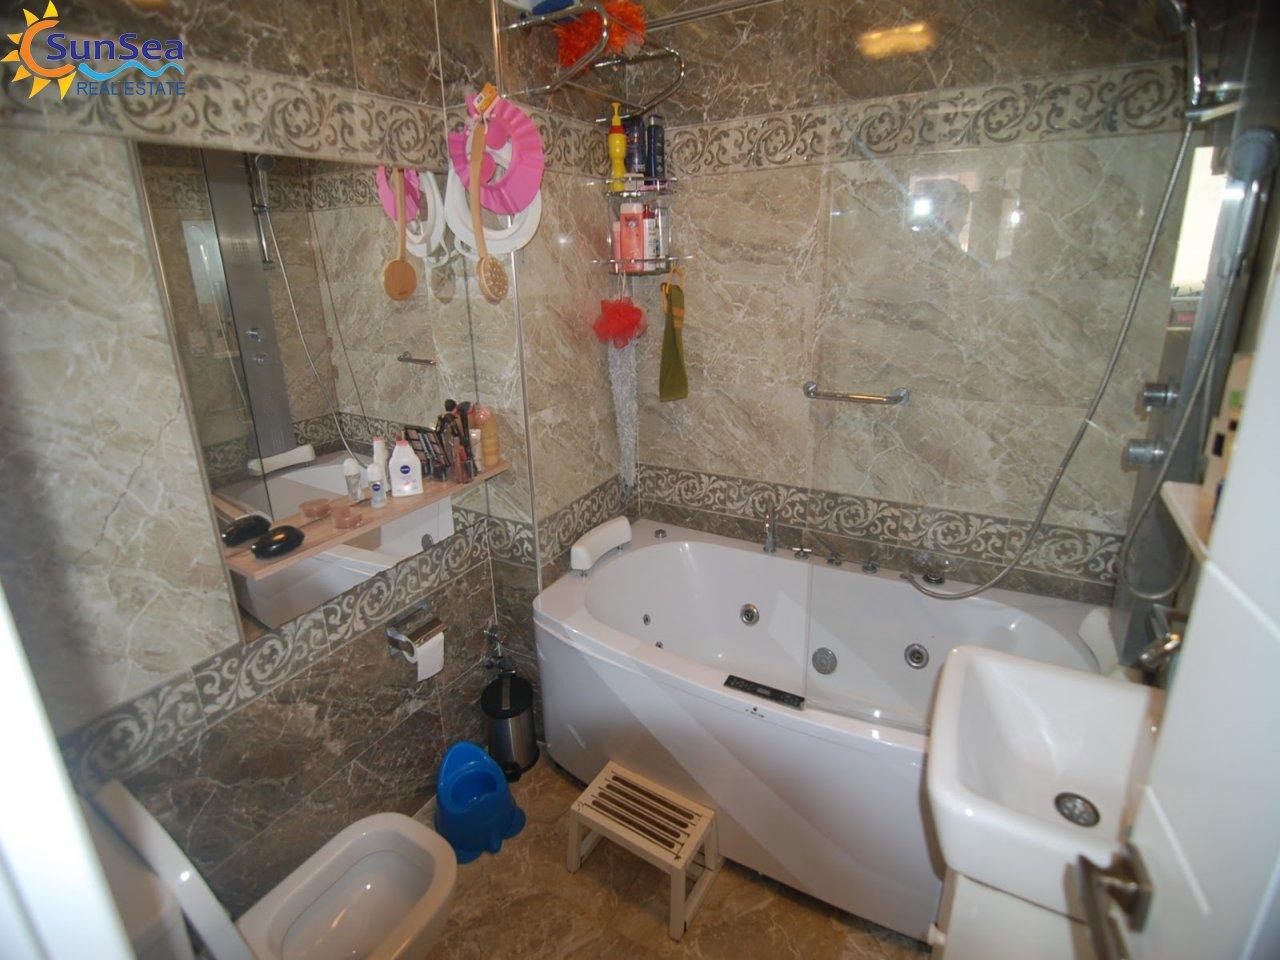 cleopatra apart bath